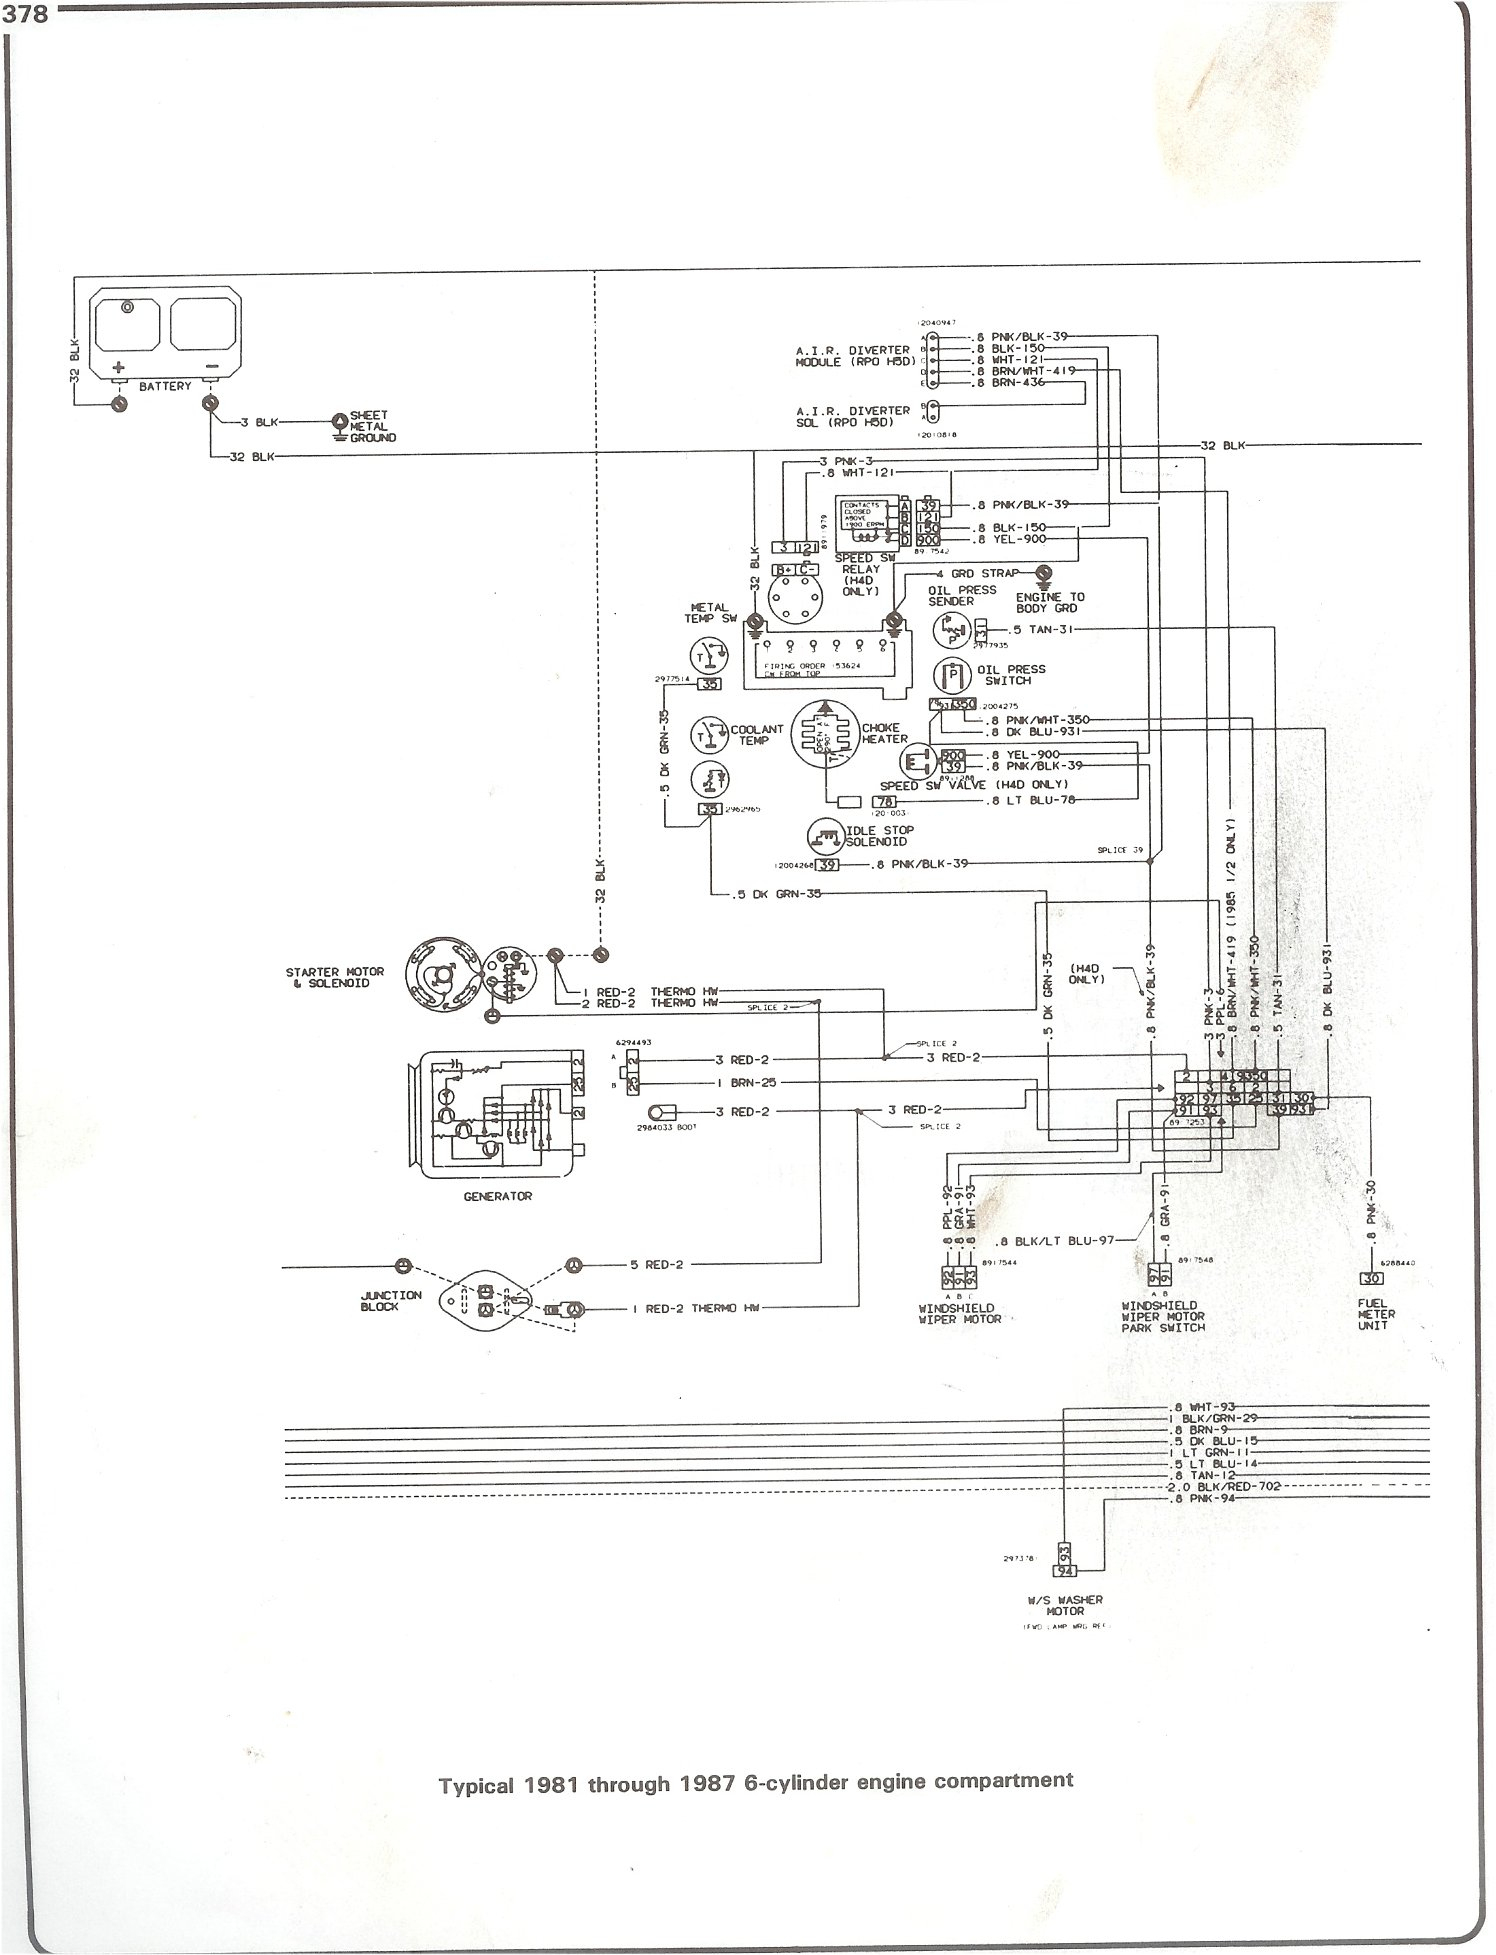 hight resolution of 2002 chevy tracker fuel gauge wiring wiring diagram advance 2002 chevy tracker fuel gauge wiring